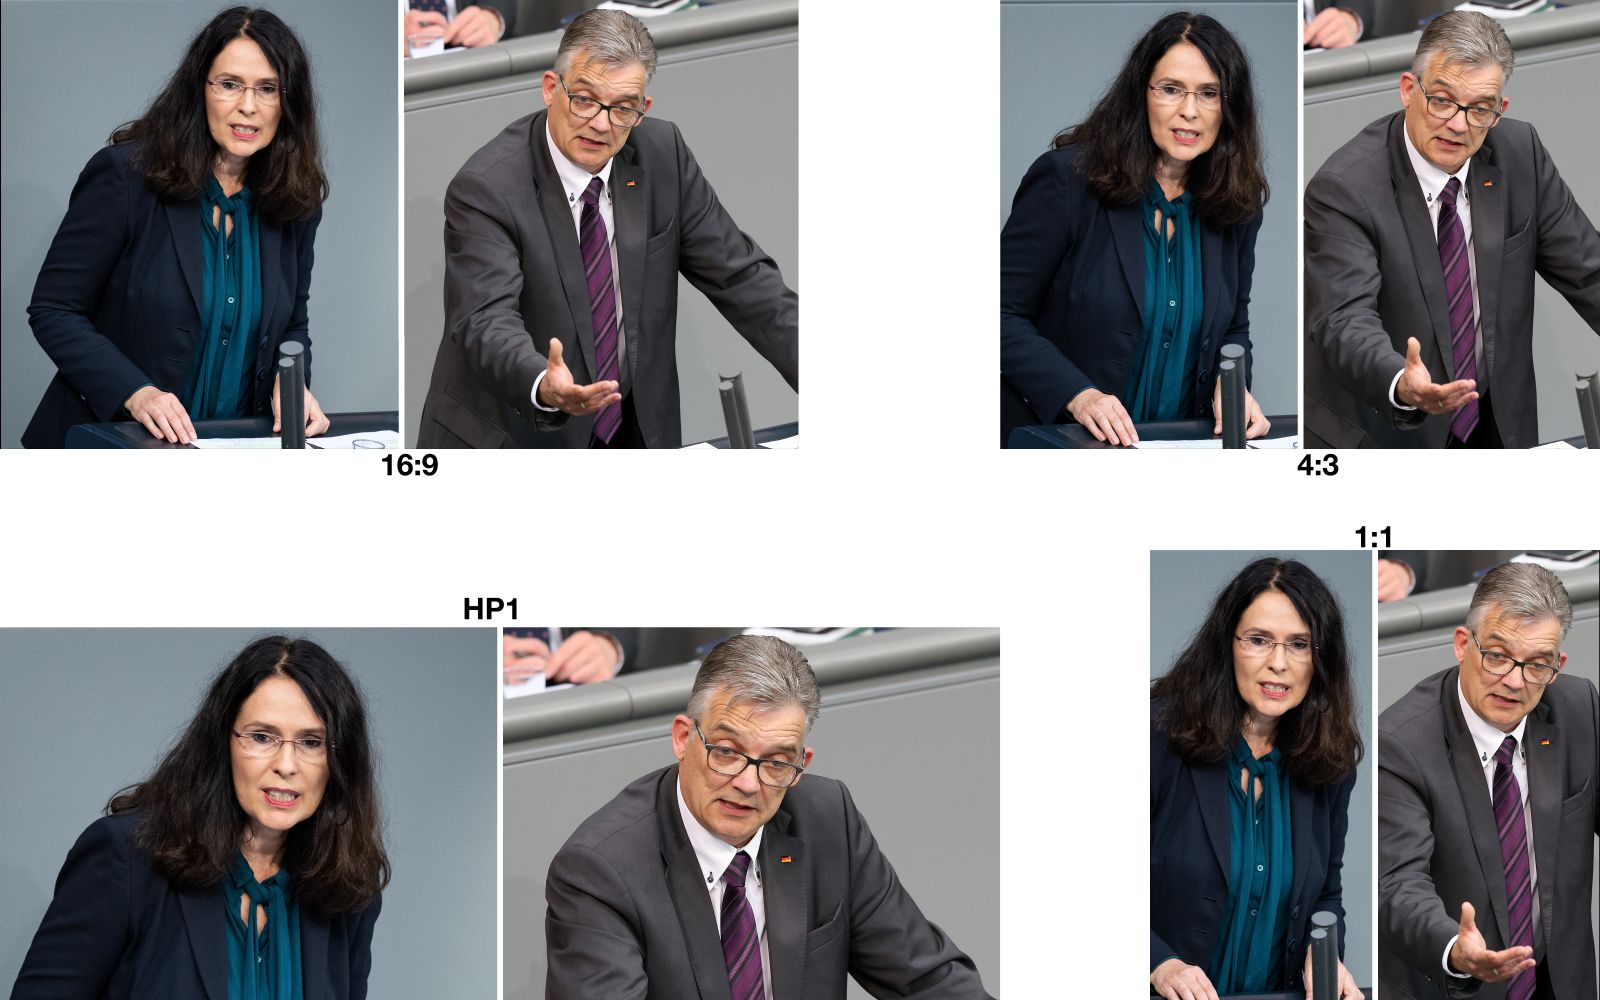 EINMALIGE VERWENDUNG KOMBO Elisabeth Winkelmeier-Becker/ Uwe Feiler/ CDU